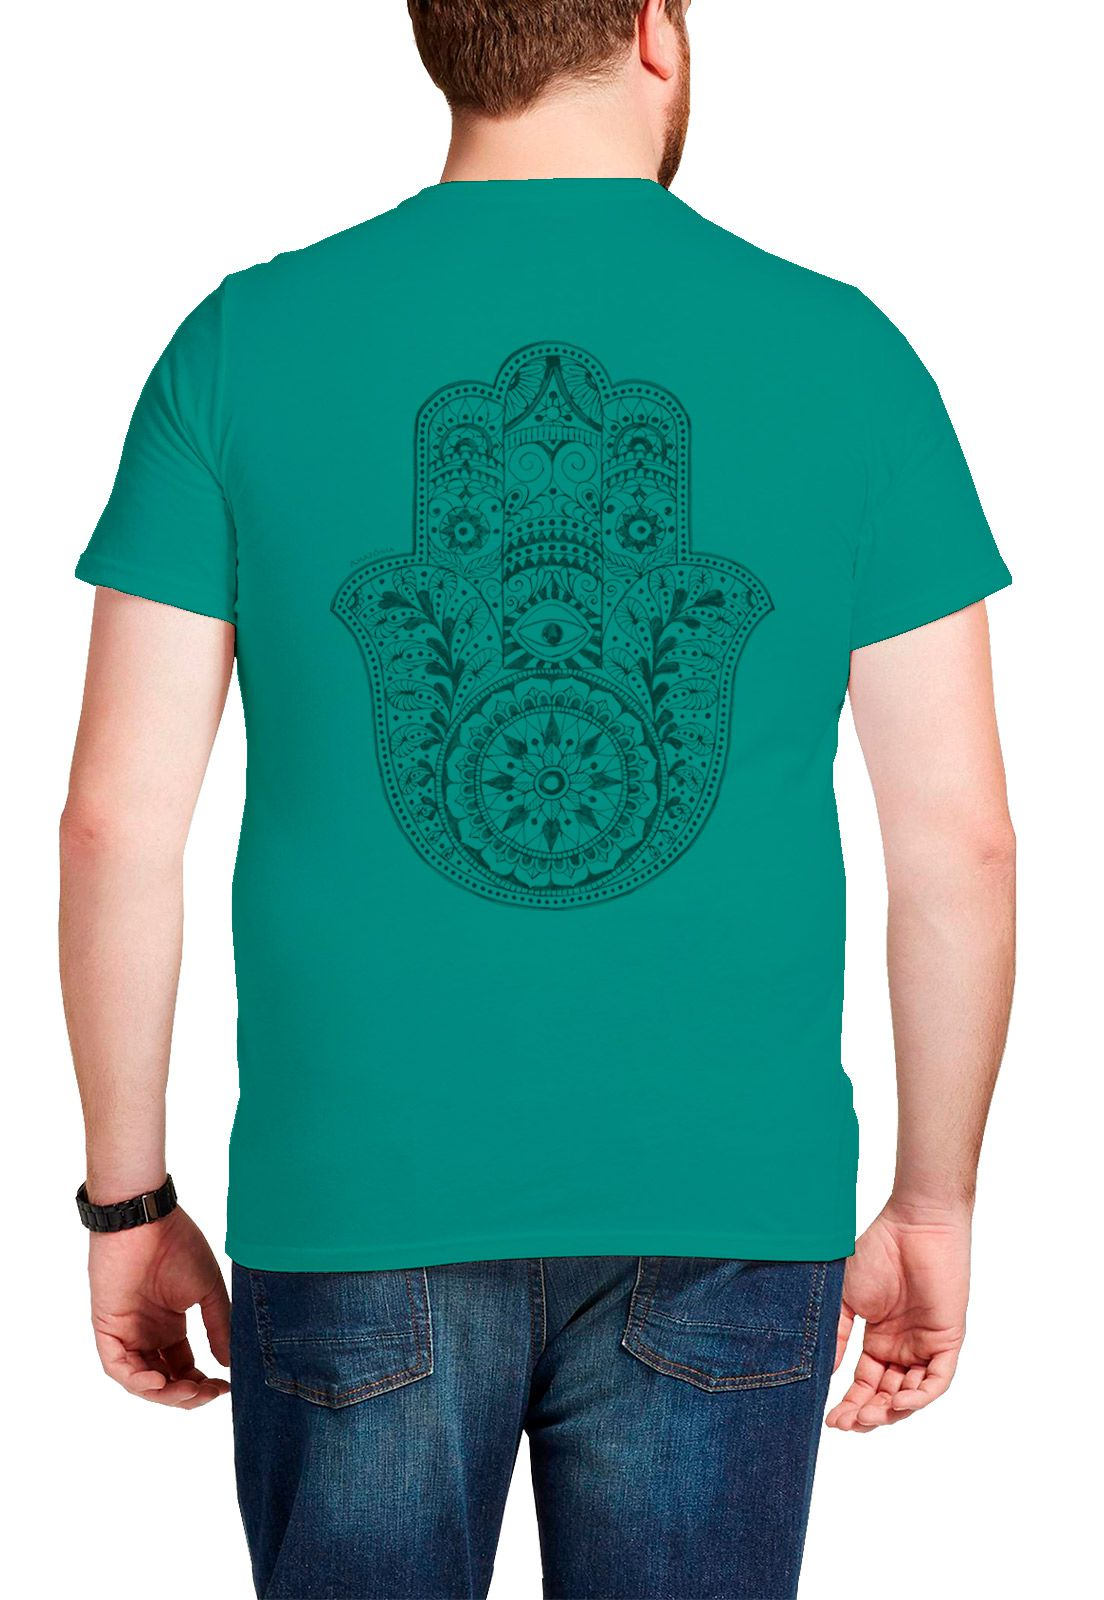 Camiseta Amazônia Hamsa - Azul